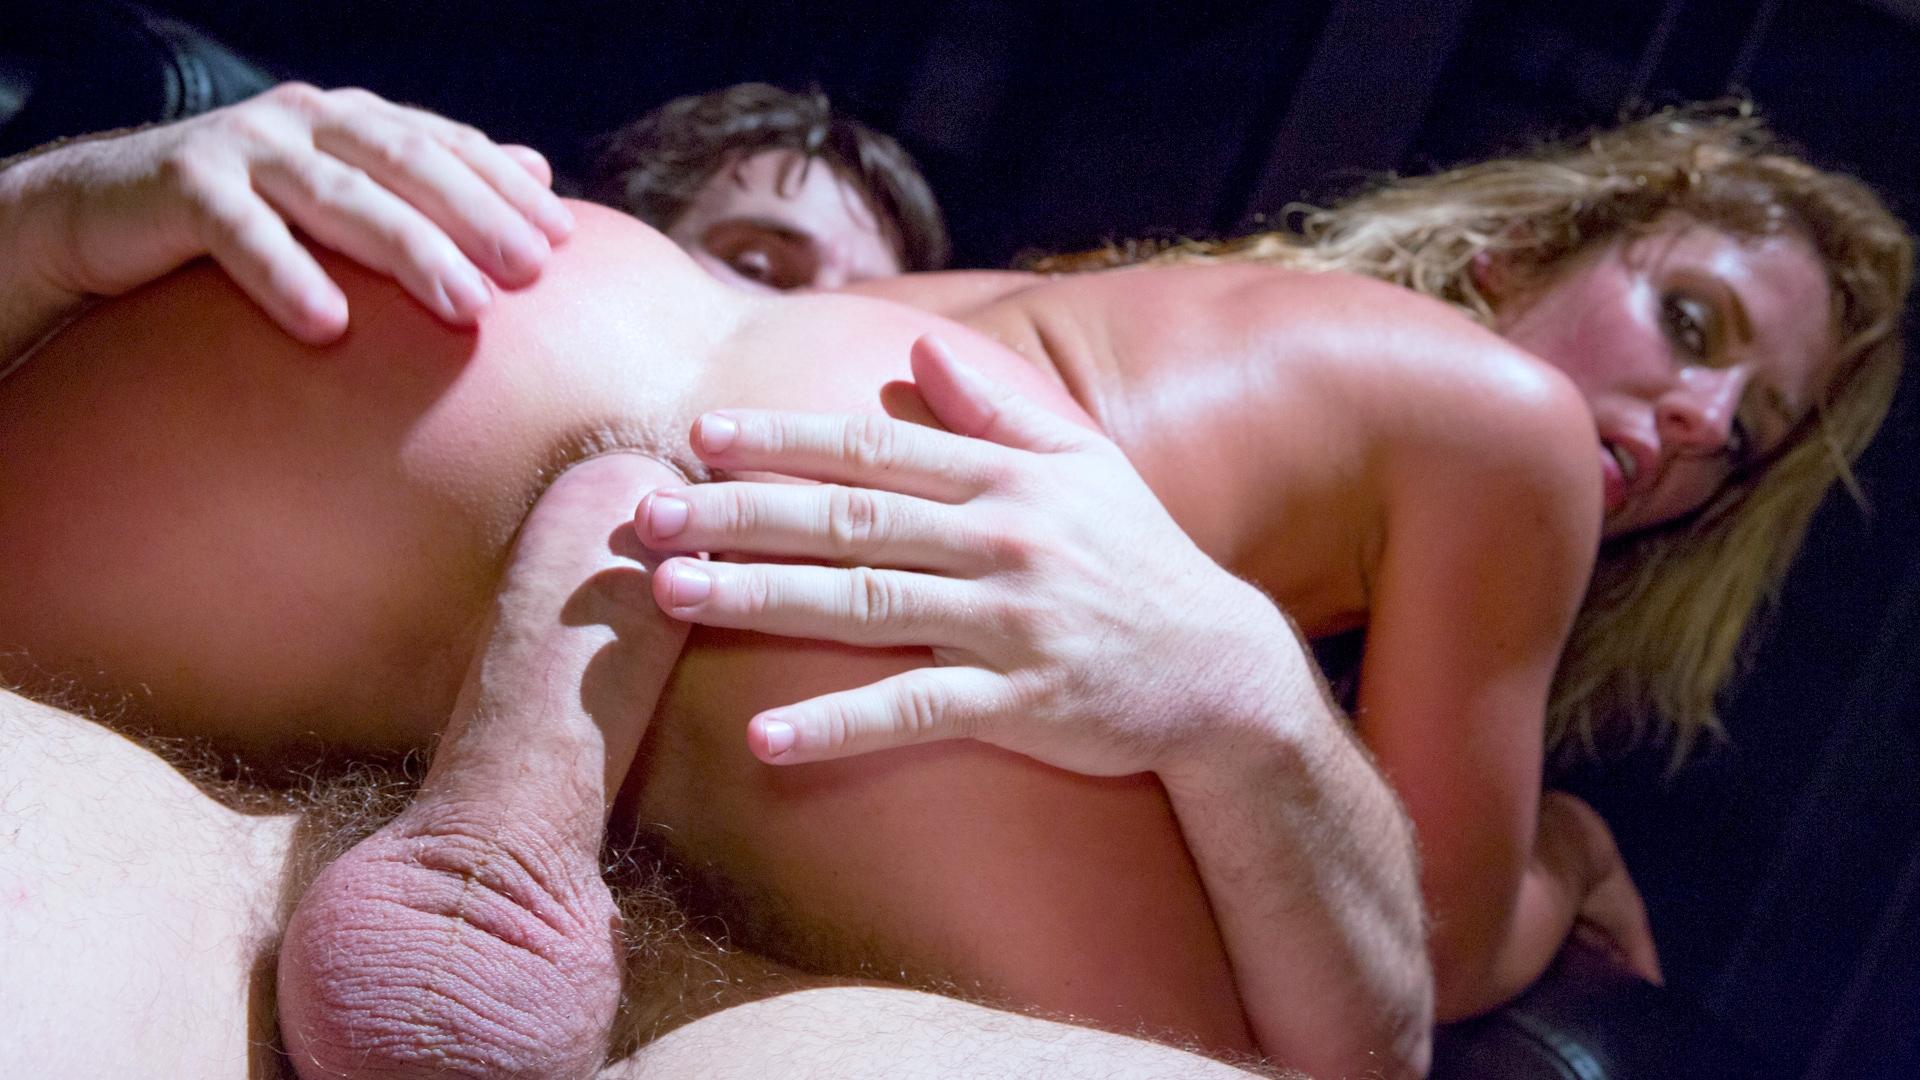 ManuelFerrara.com - Sheena Shaw In An Oily Evil Anal Encounter...